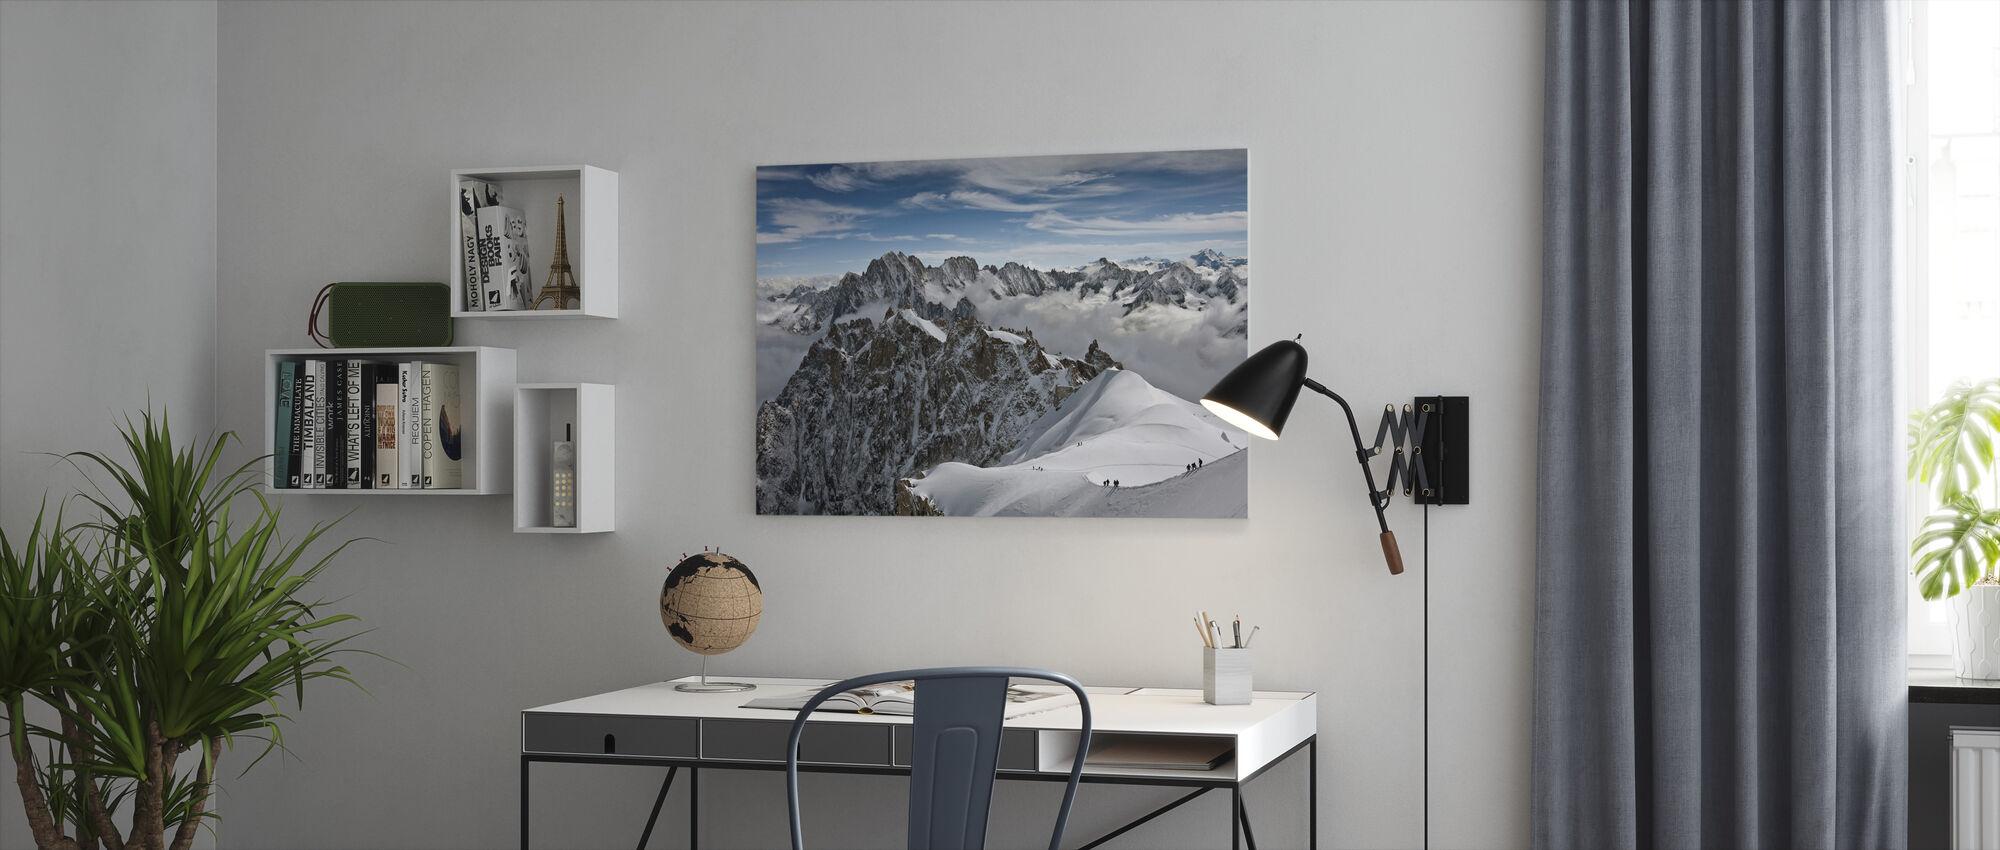 Gezicht op Alpen - Canvas print - Kantoor